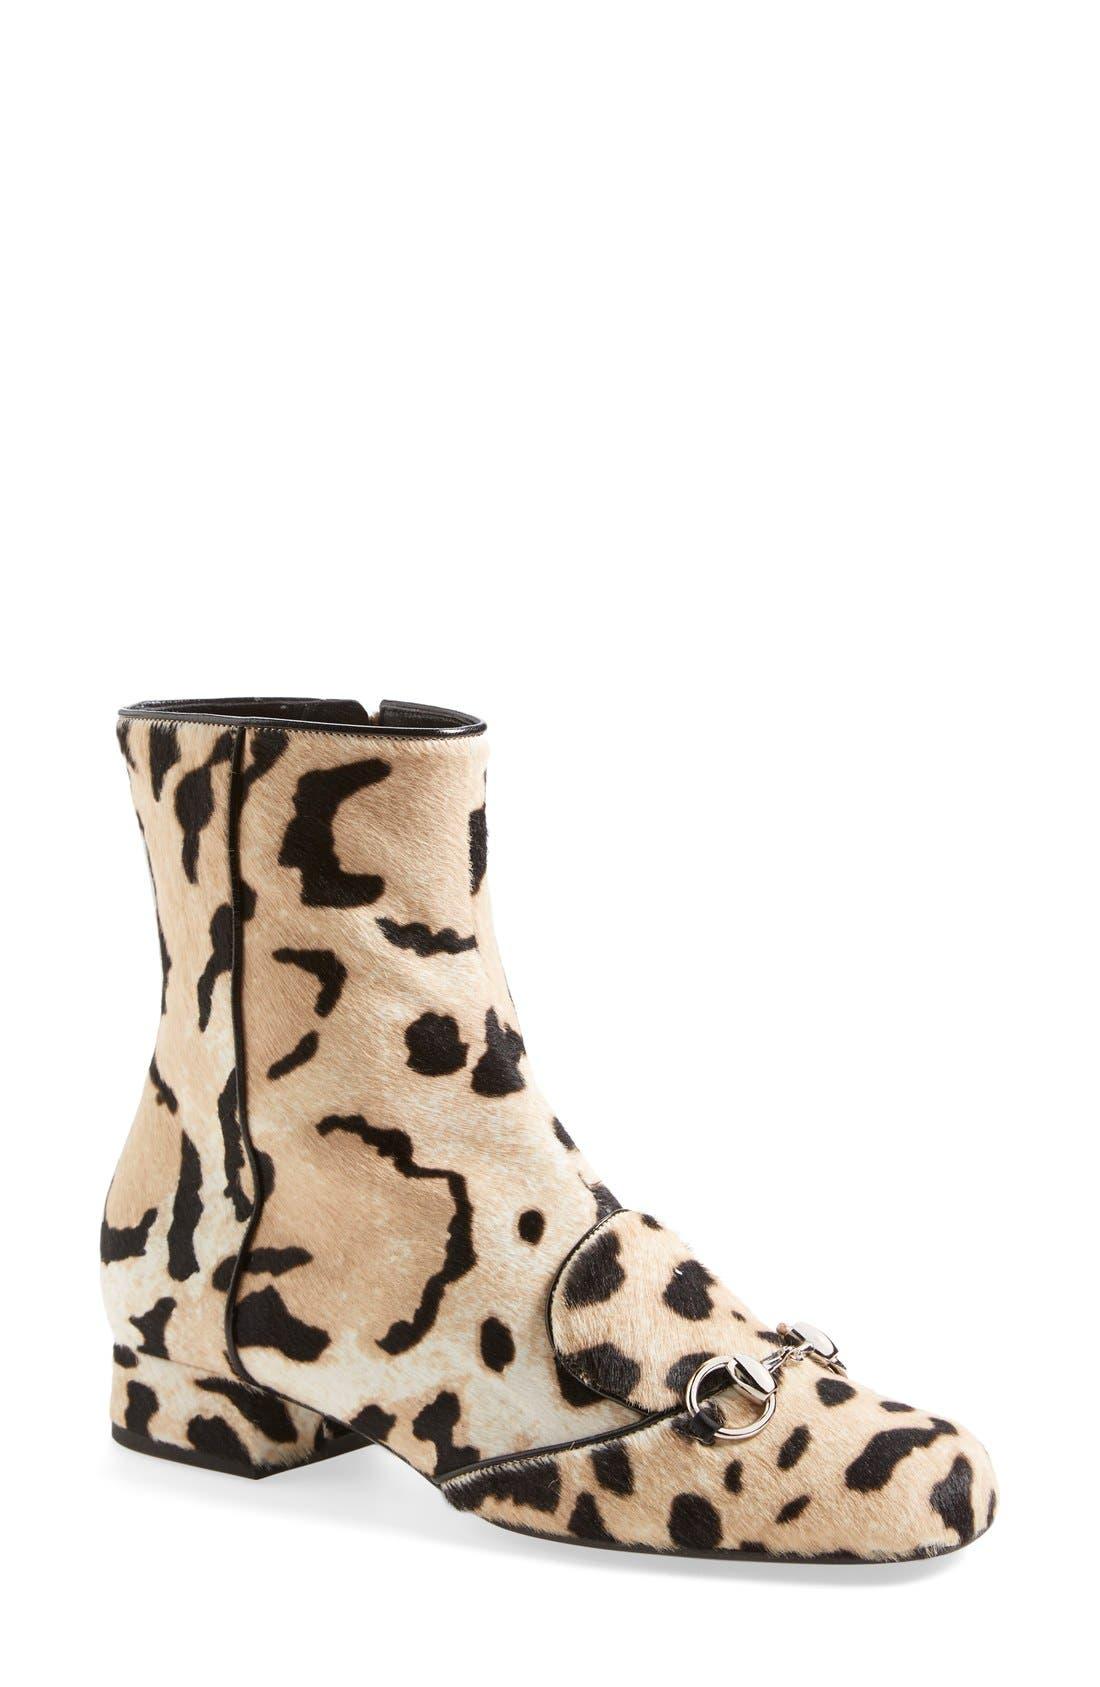 Main Image - Gucci 'Lillian' Horsebit Animal Print Calf Hair Short Bootie (Women)